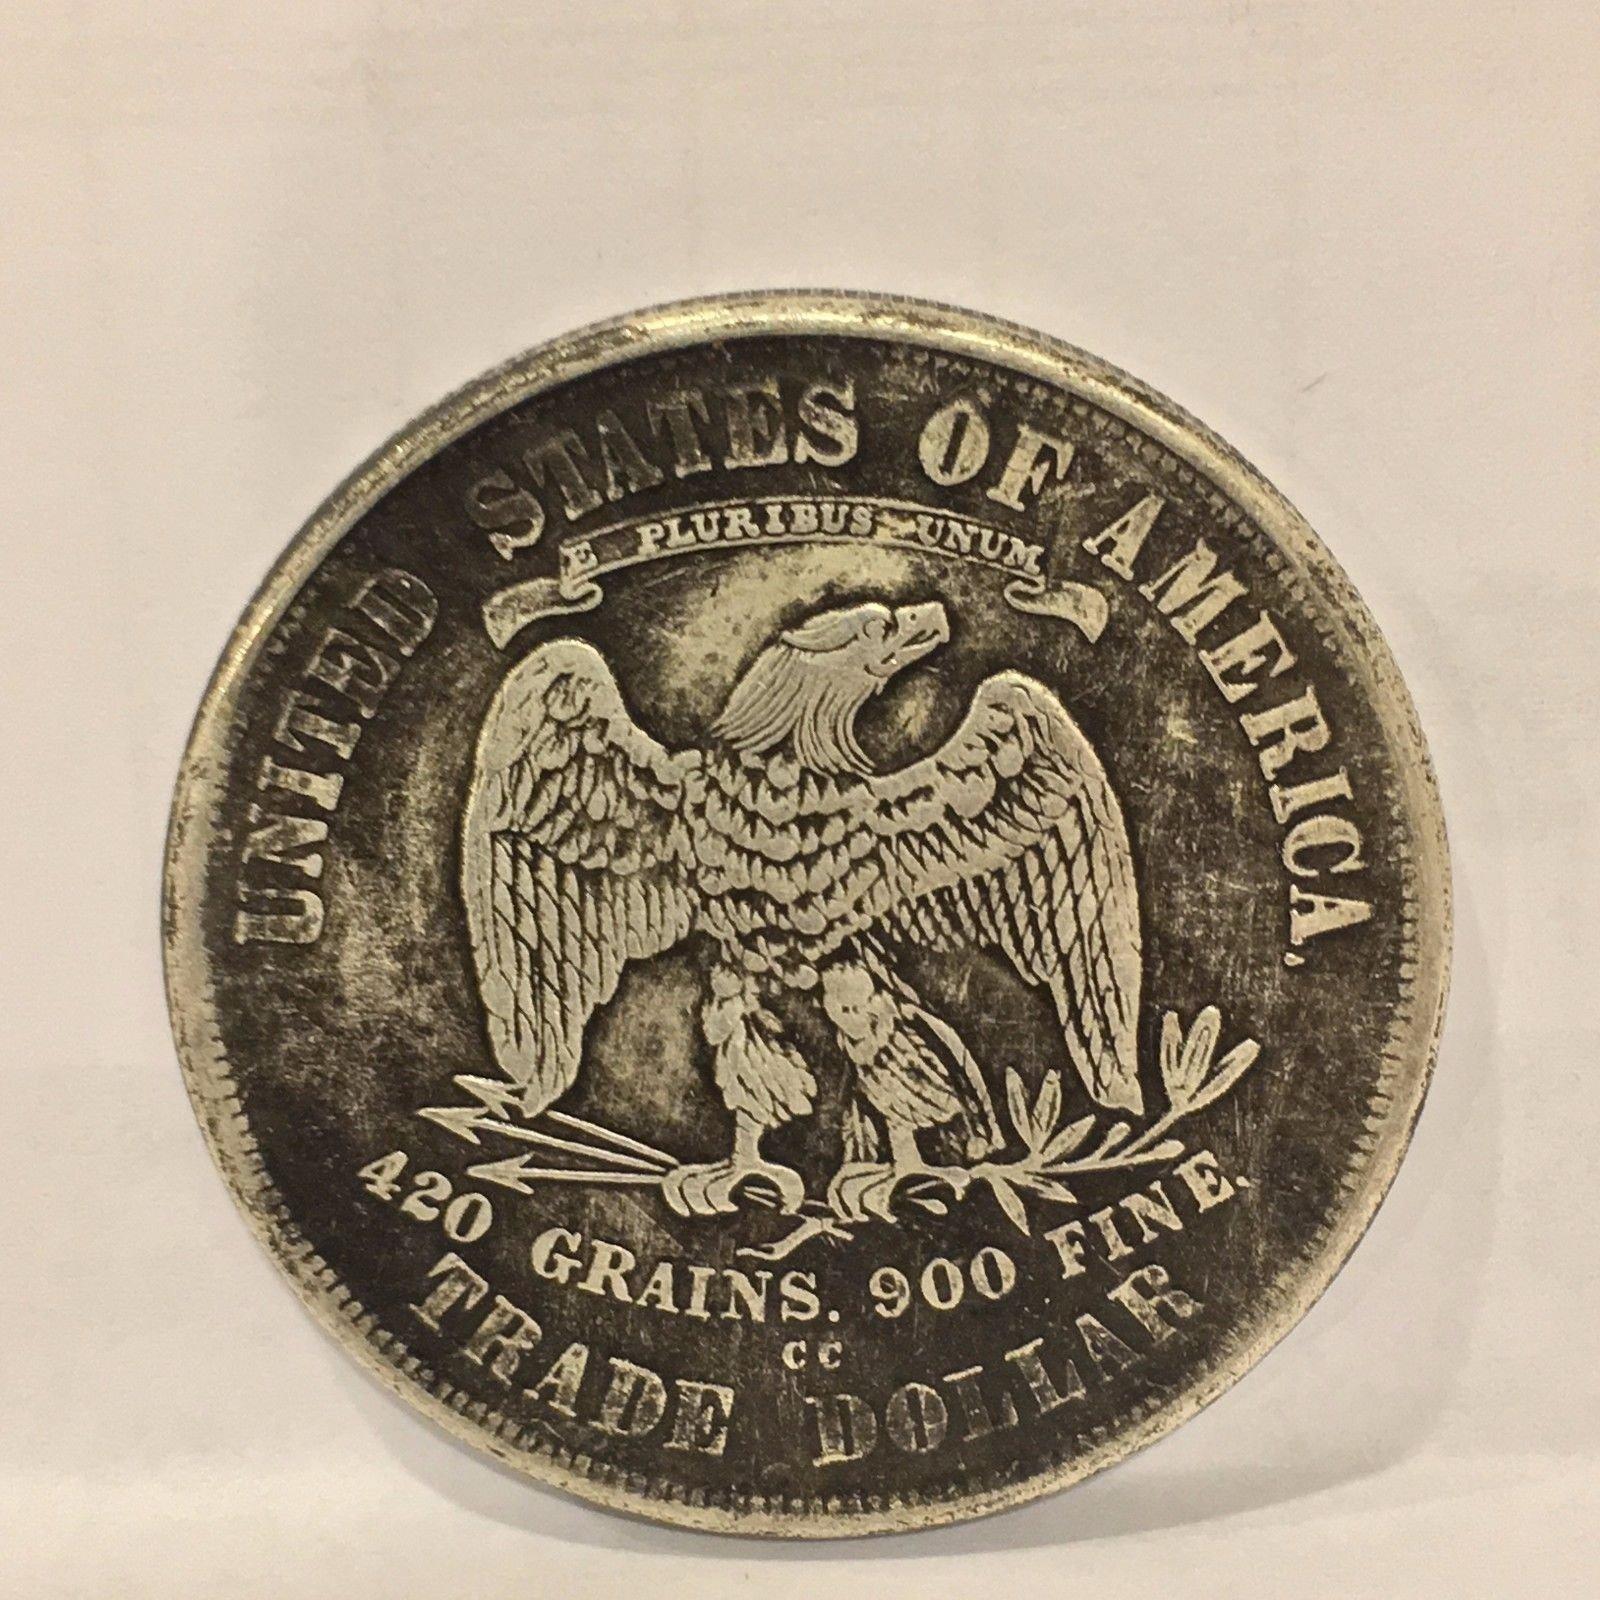 1791 Silver Dollar Value - New Dollar Wallpaper HD Noeimage Org